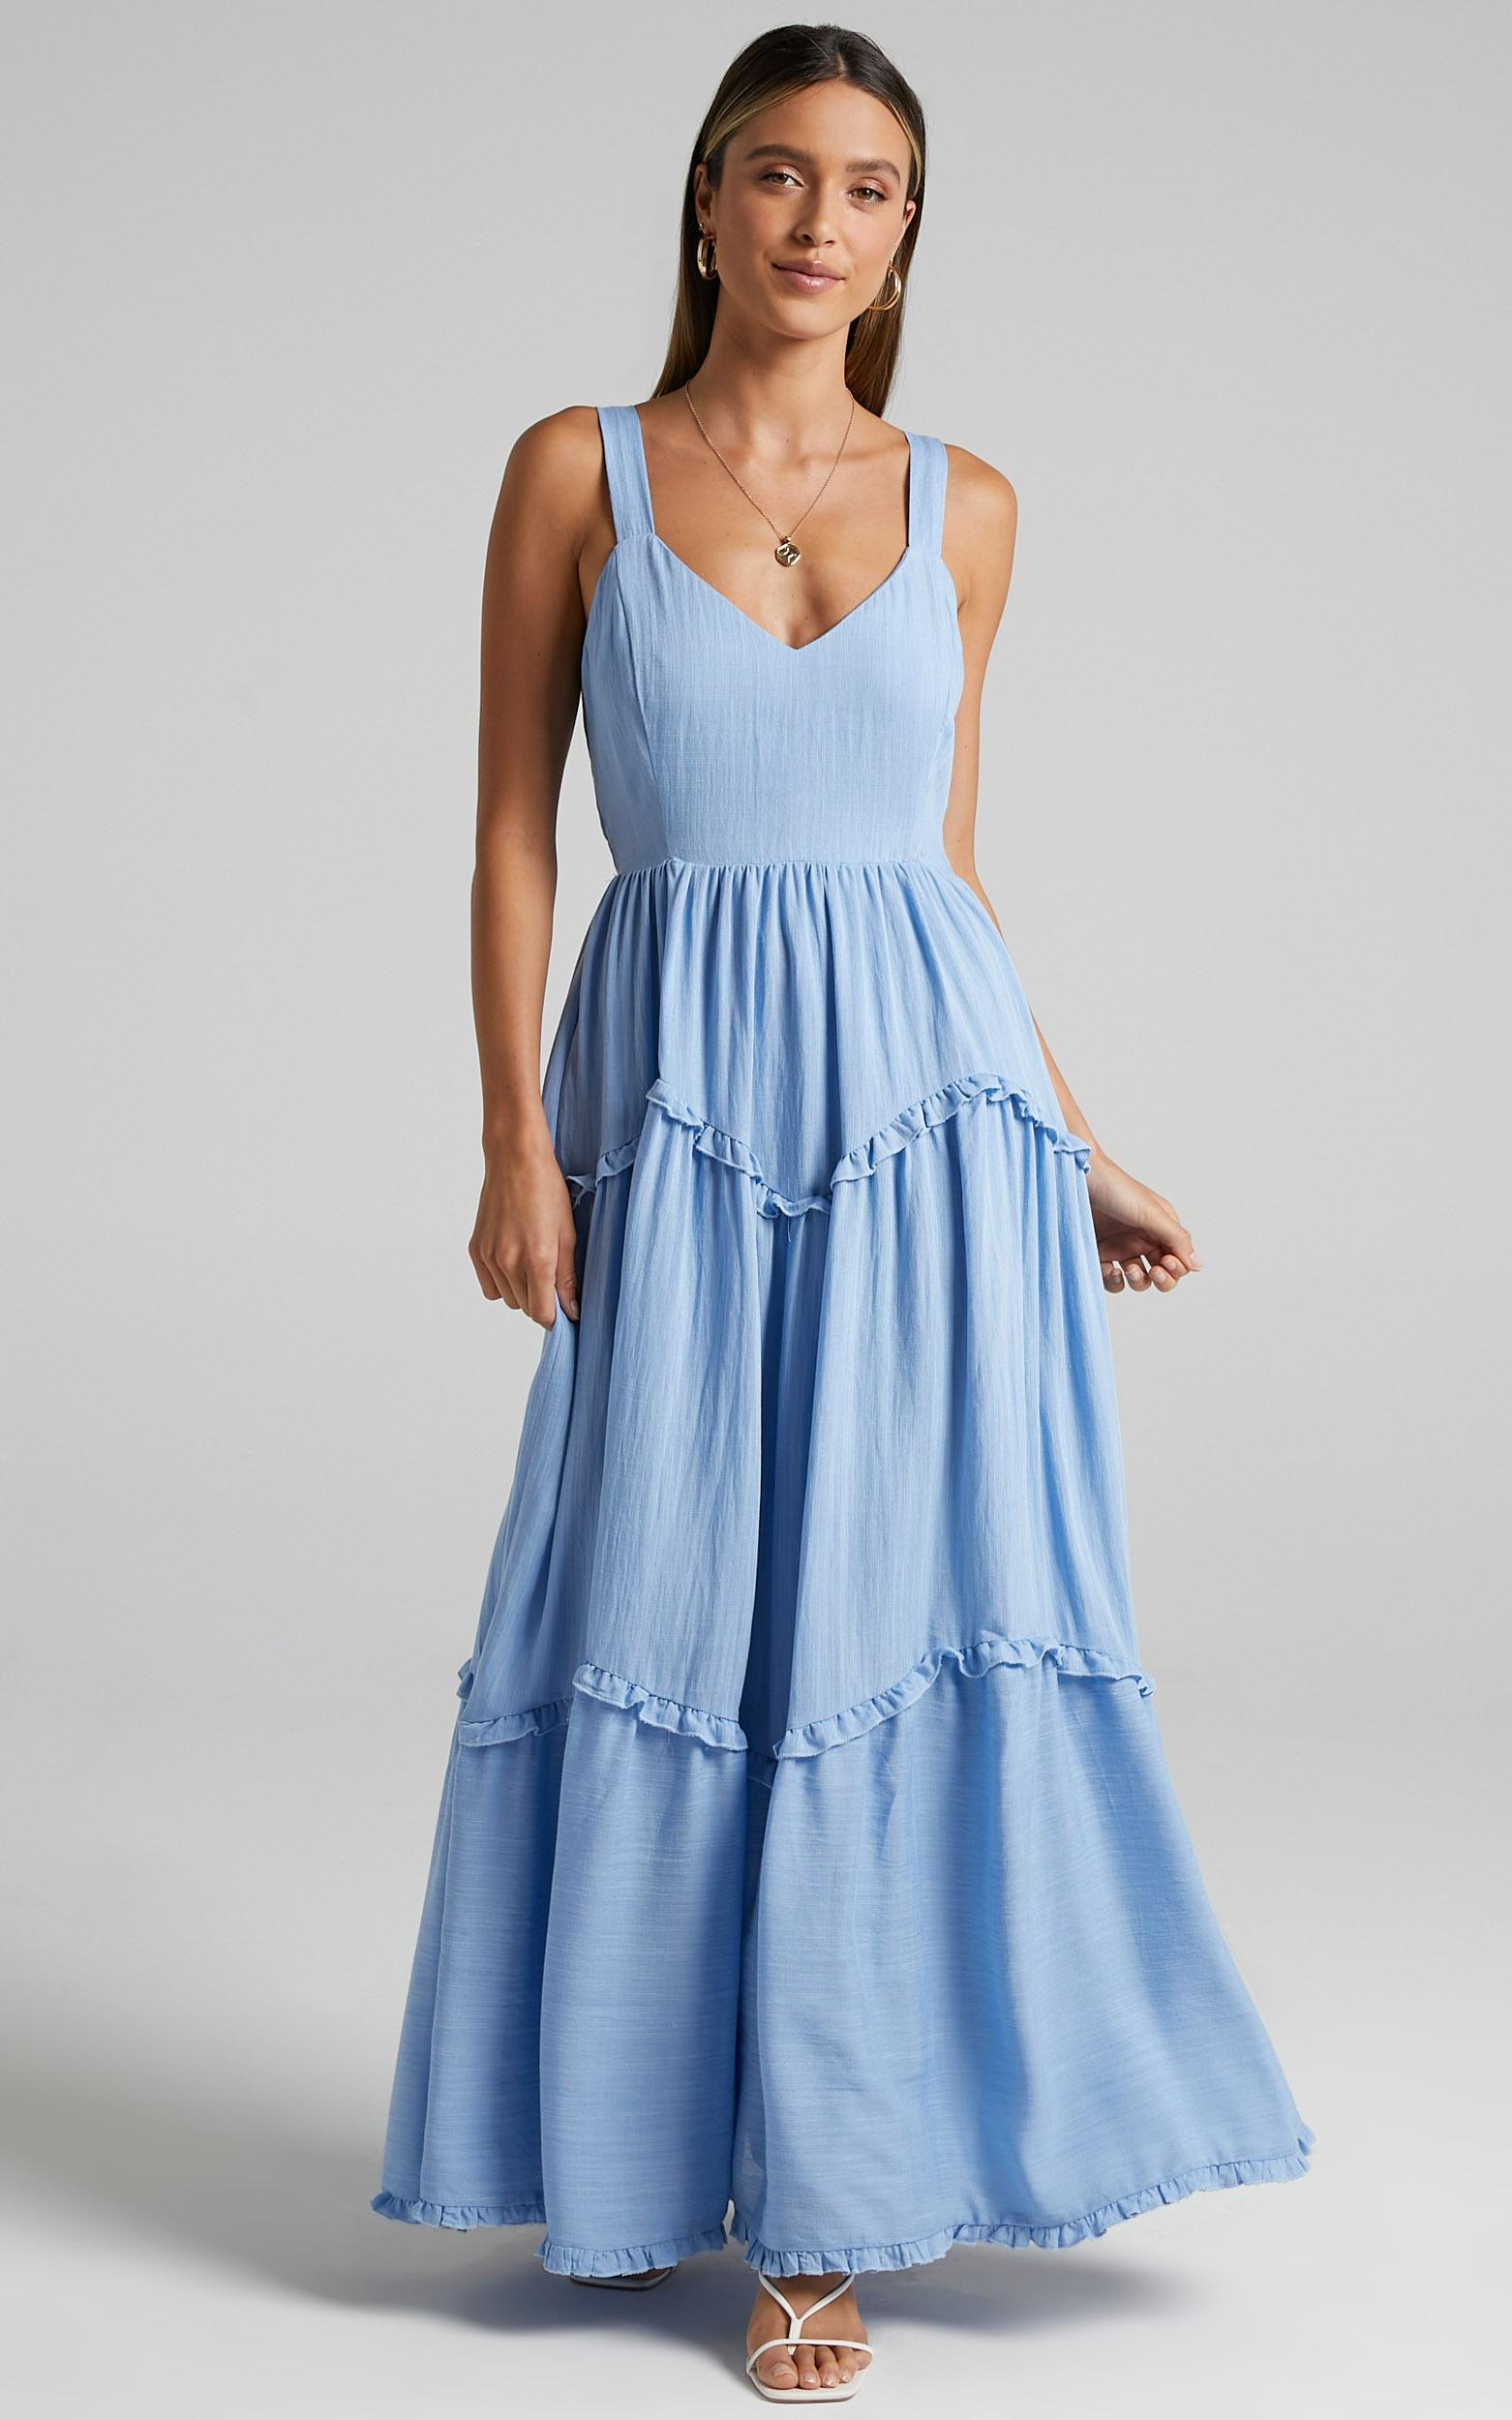 Sakura Dress in Periwinkle Blue - 6 (XS), Blue, hi-res image number null